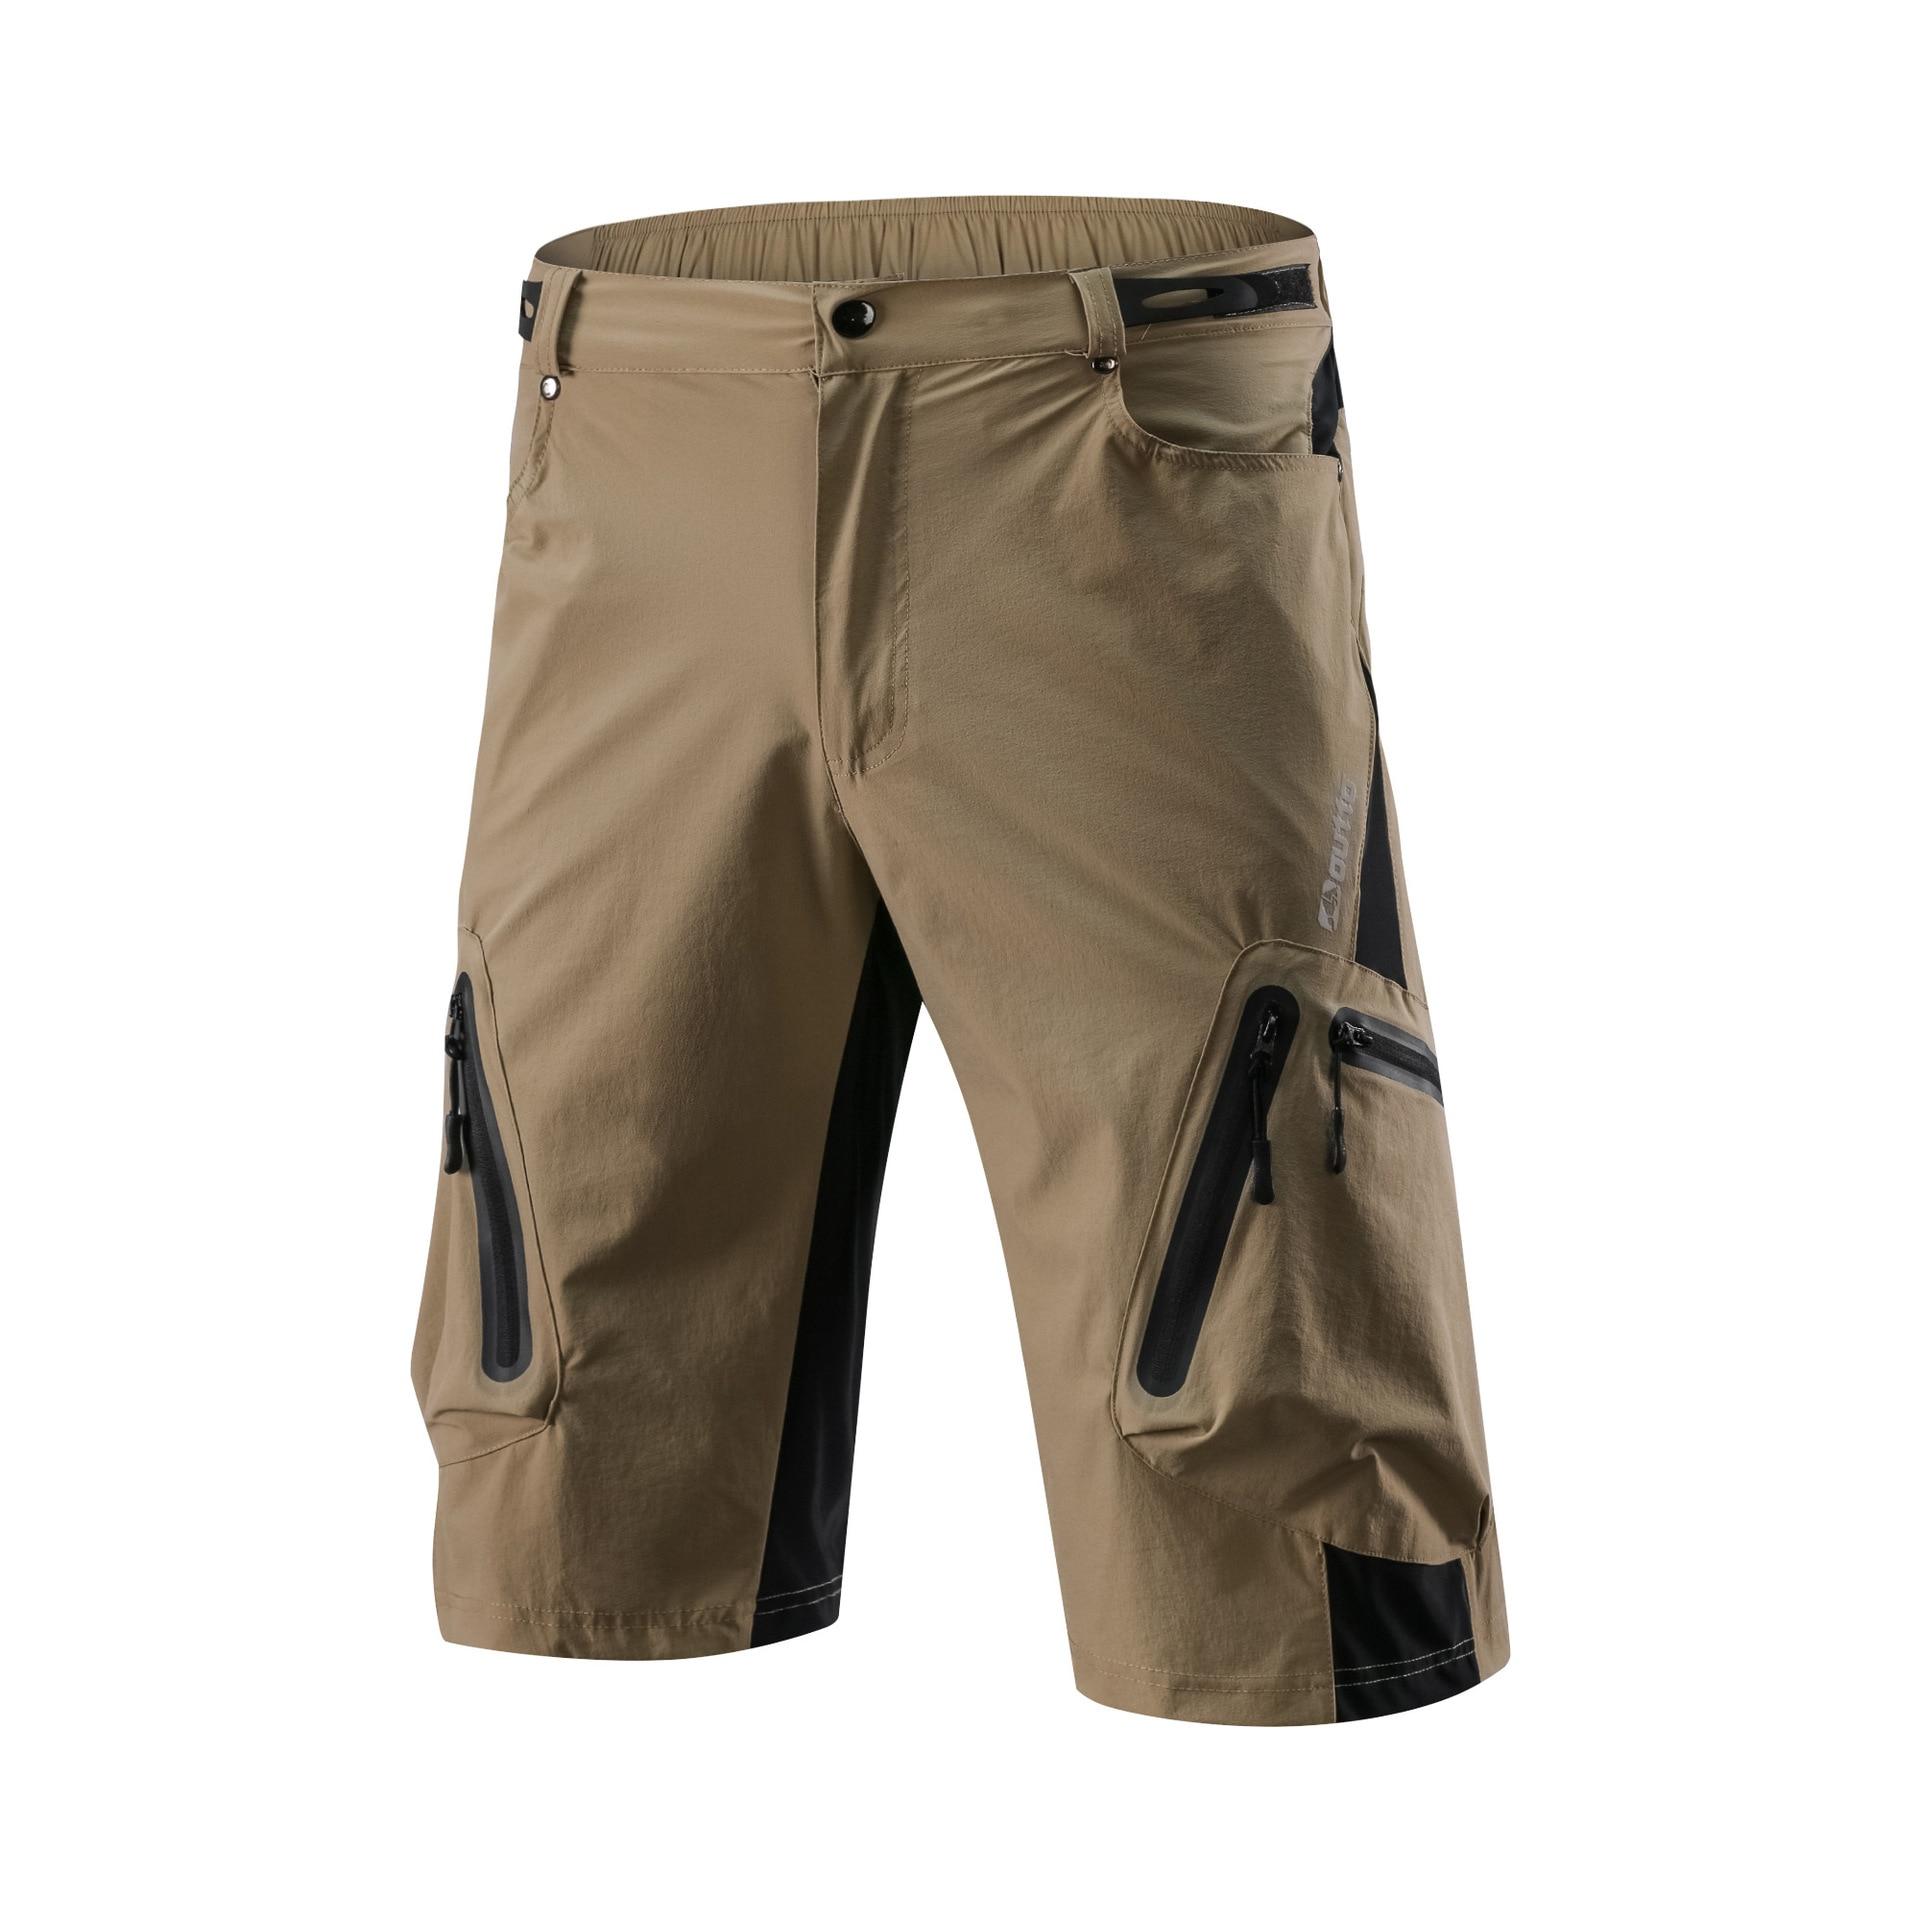 Men Cycling Shorts Loose Fit Downhill MTB Mountain Bike Short Wear  Resistant Outdoor Sport Cycling Short 74f5fa9ac